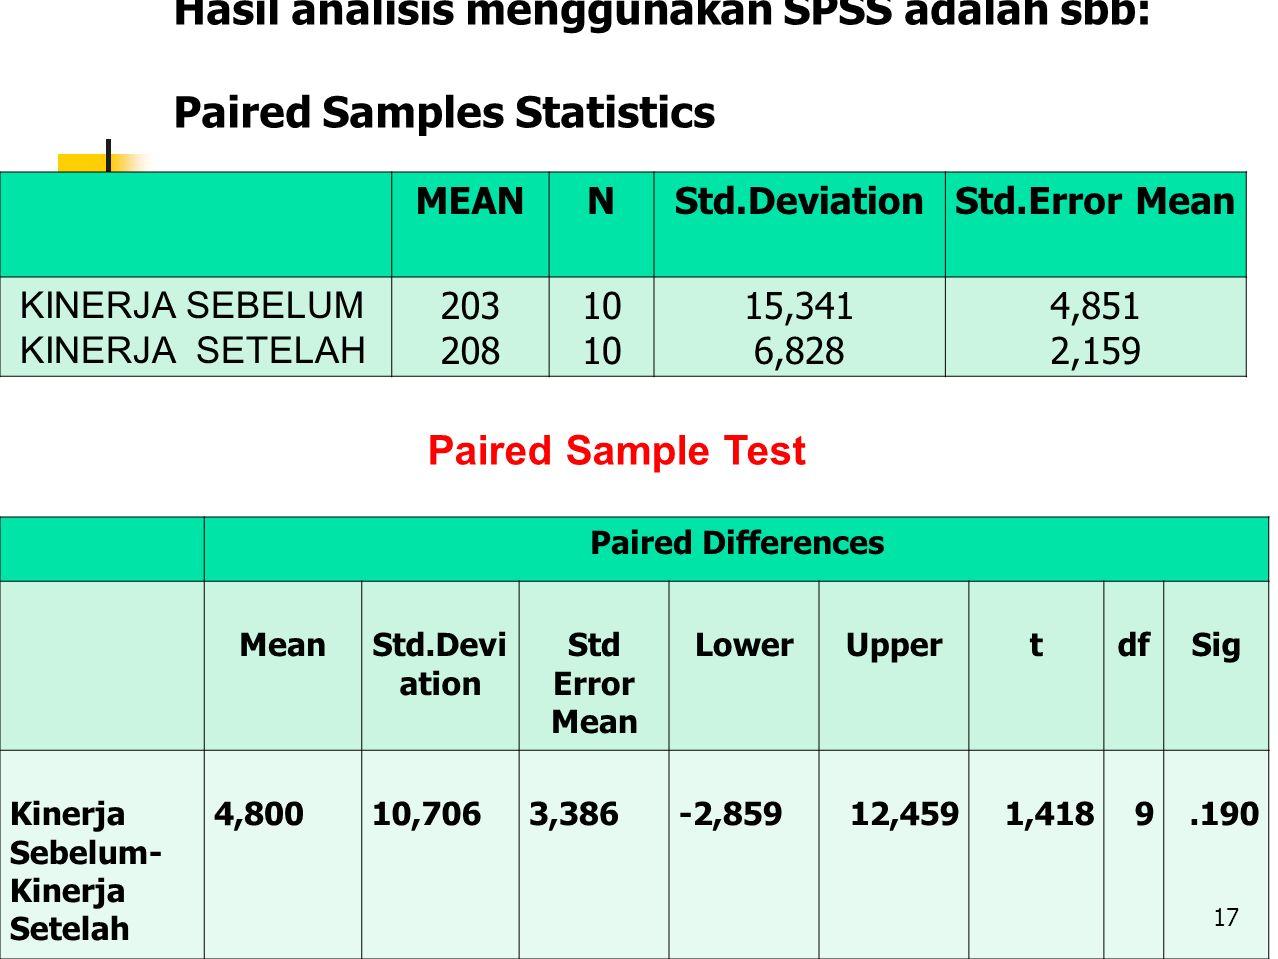 Hasil analisis menggunakan SPSS adalah sbb: Paired Samples Statistics MEANNStd.DeviationStd.Error Mean KINERJA SEBELUM KINERJA SETELAH 203 208 10 15,341 6,828 4,851 2,159 Paired Differences MeanStd.Devi ation Std Error Mean LowerUppertdfSig Kinerja Sebelum- Kinerja Setelah 4,80010,7063,386-2,85912,4591,4189.190 Paired Sample Test 17